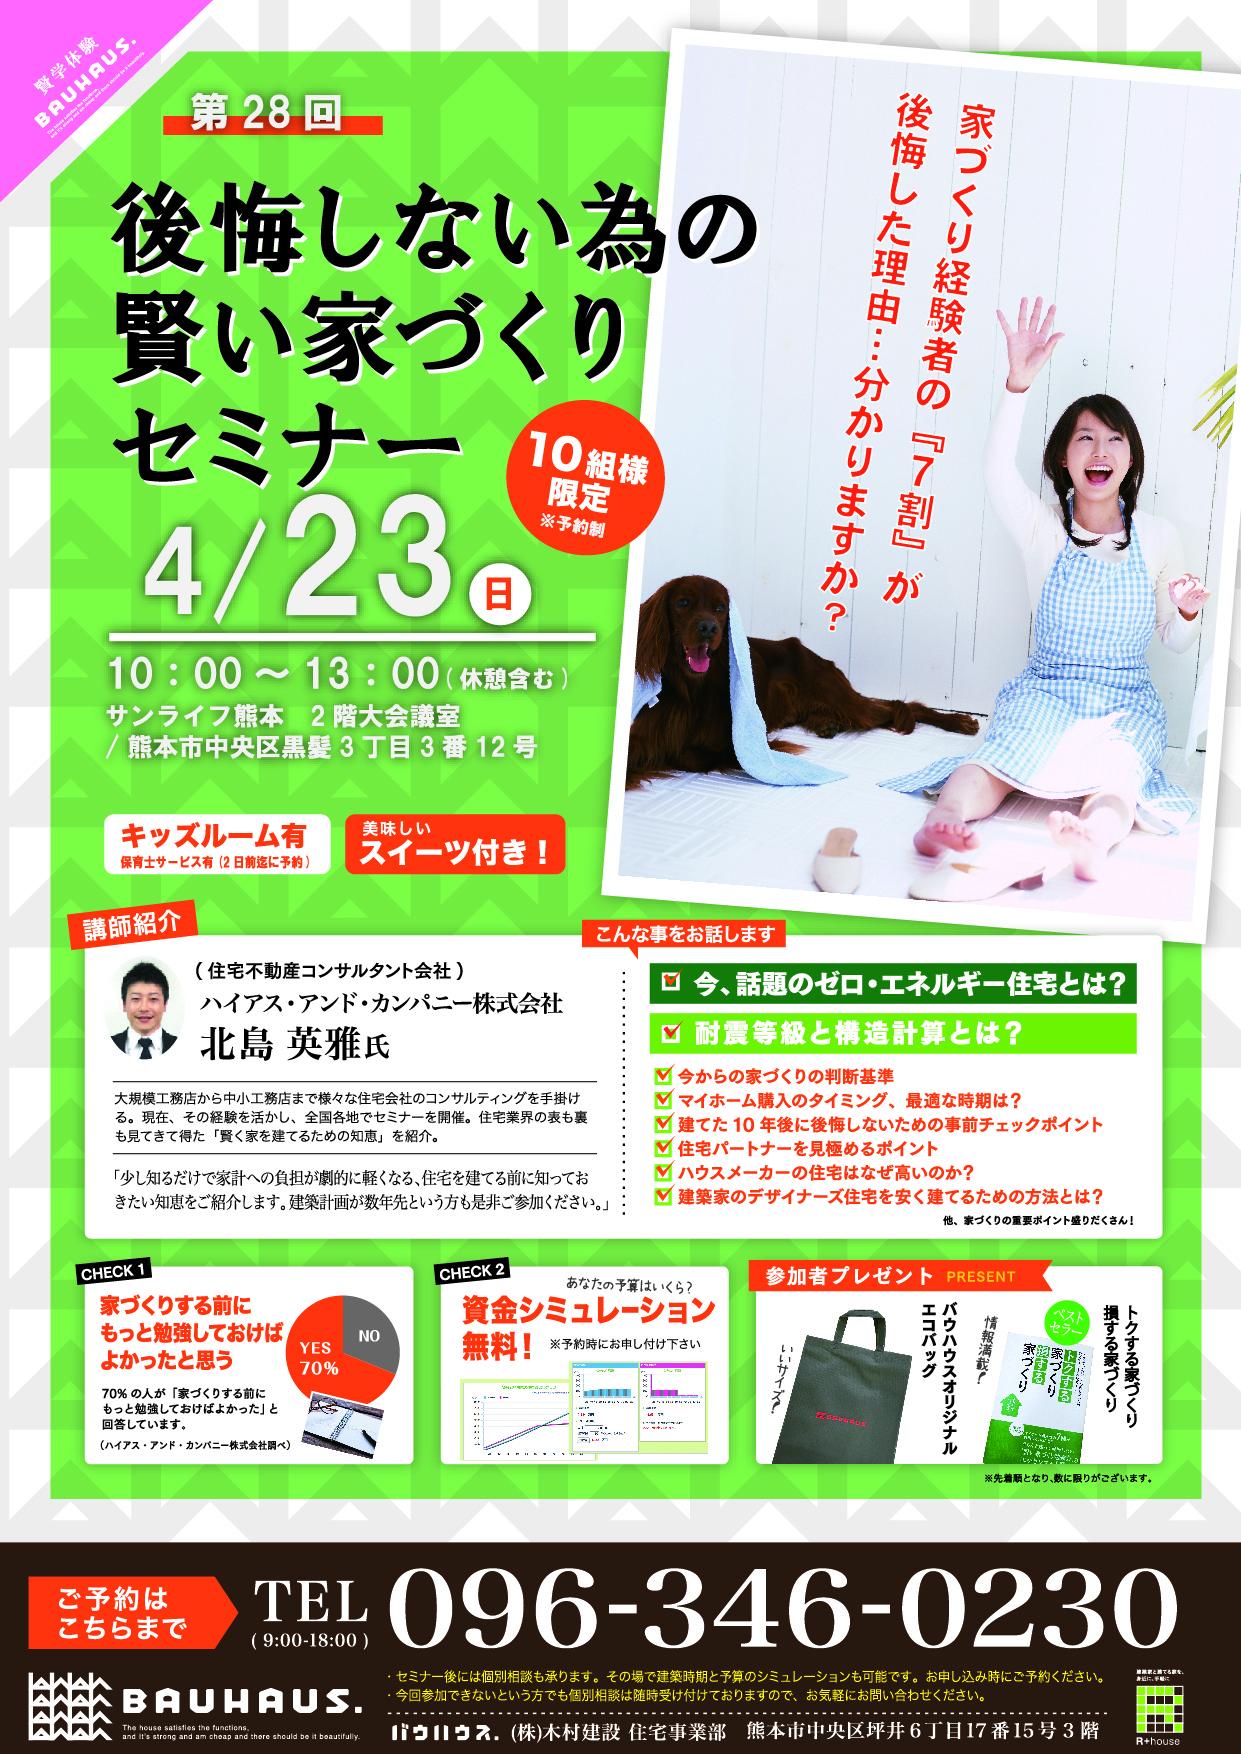 a4_ラクスル0423勉強会 -02